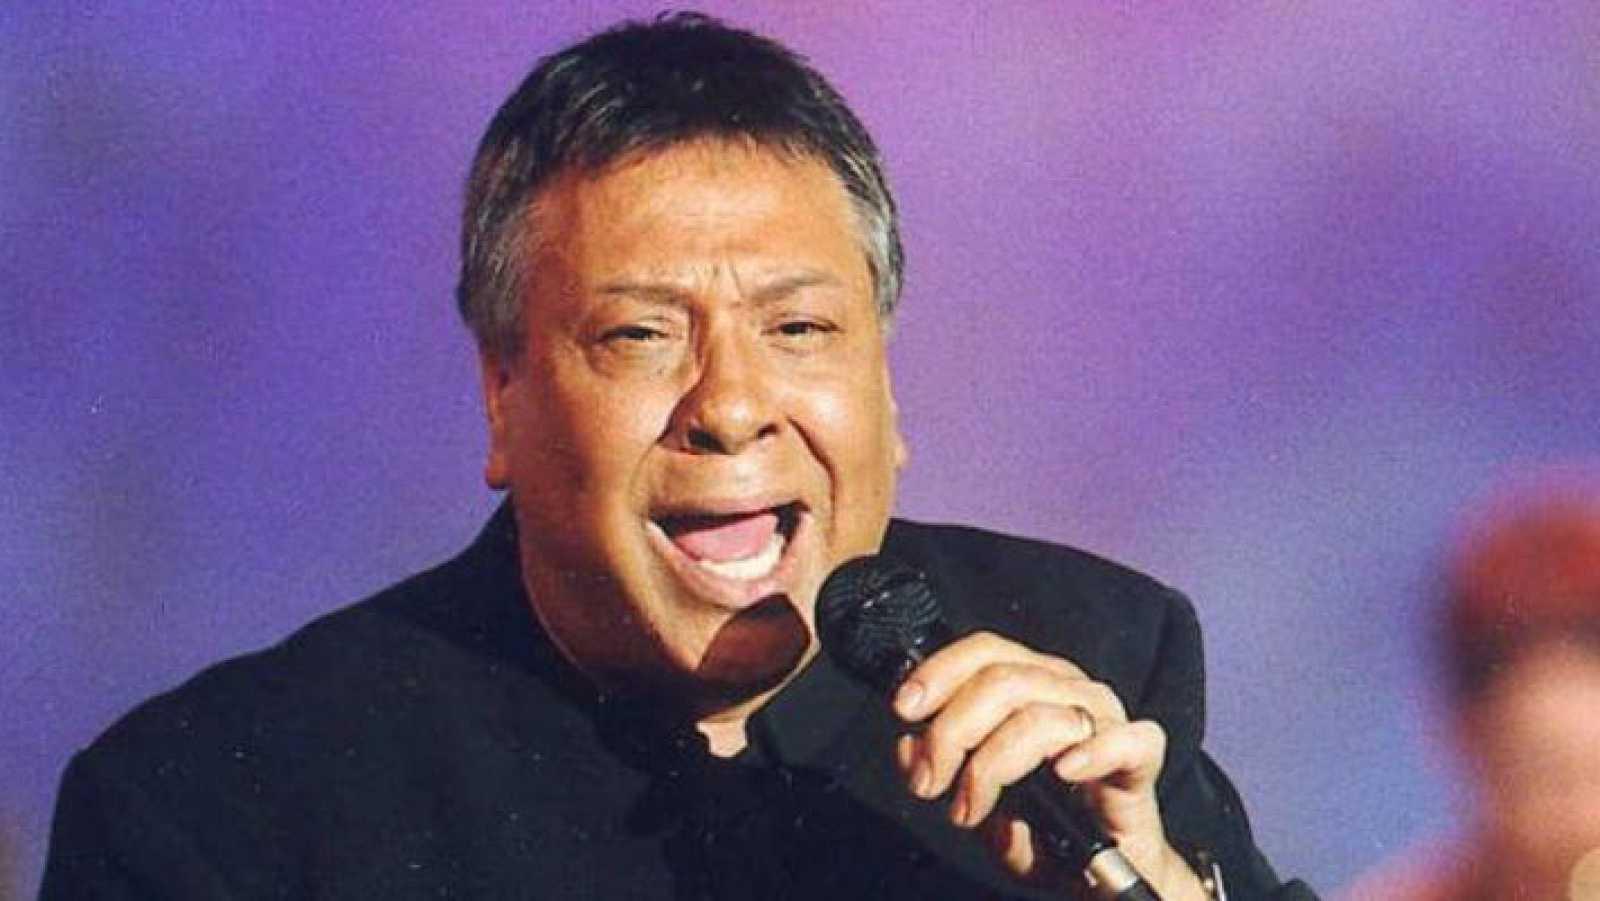 Gitanos - Homenaje a Moncho, el gitano del bolero - 06/01/19 - Escuchar ahora